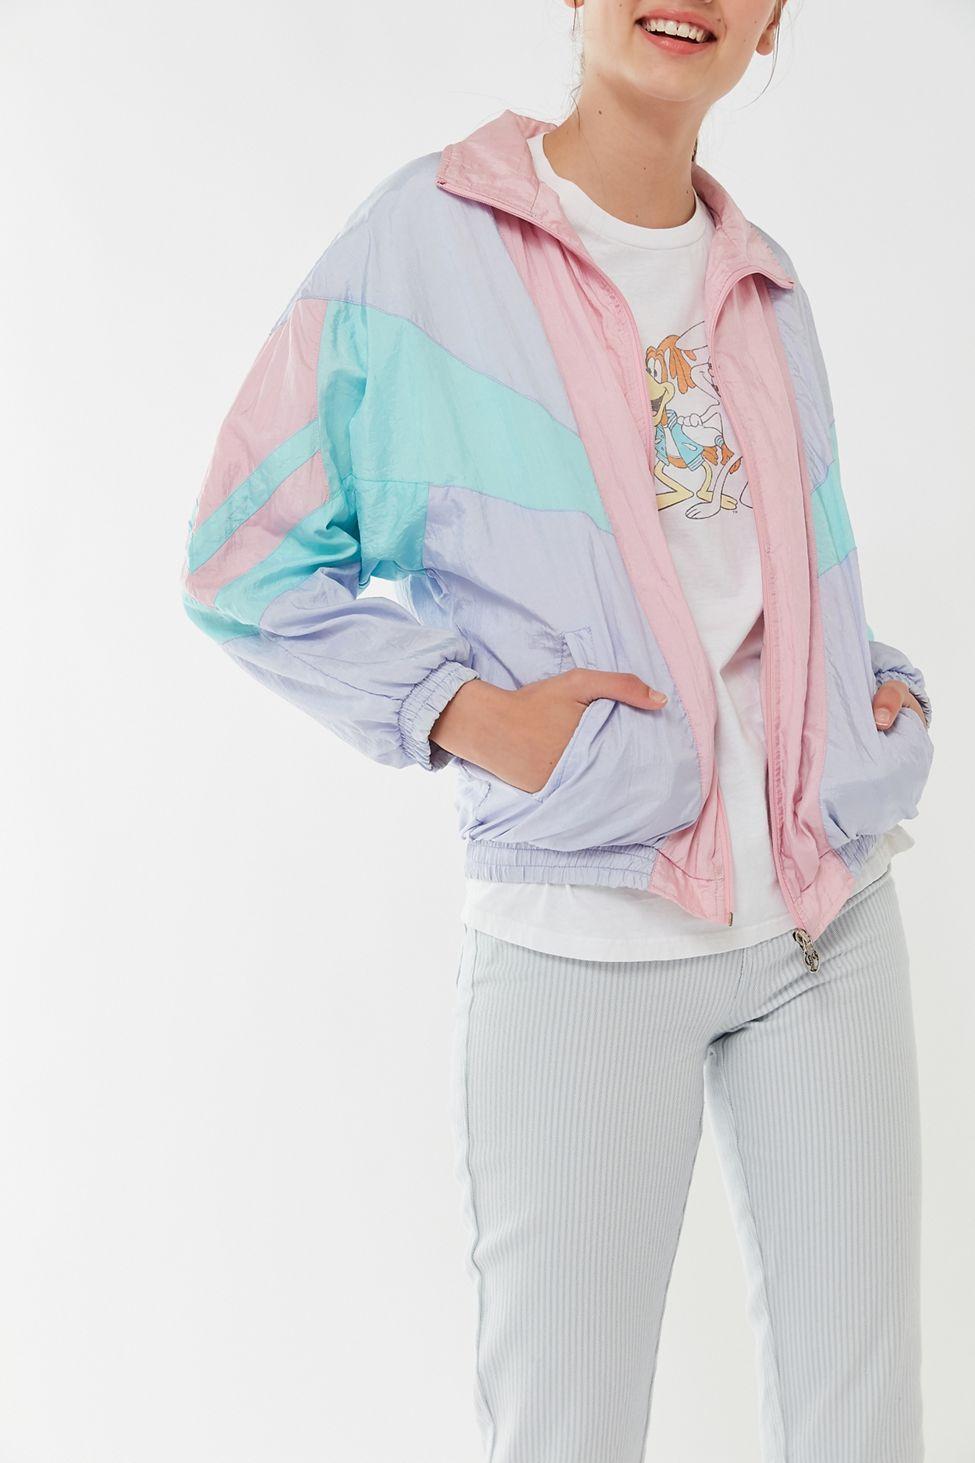 Vintage Assorted Colorblock Windbreaker Jacket Windbreaker Outfit Windbreaker Jacket Color Block Jacket